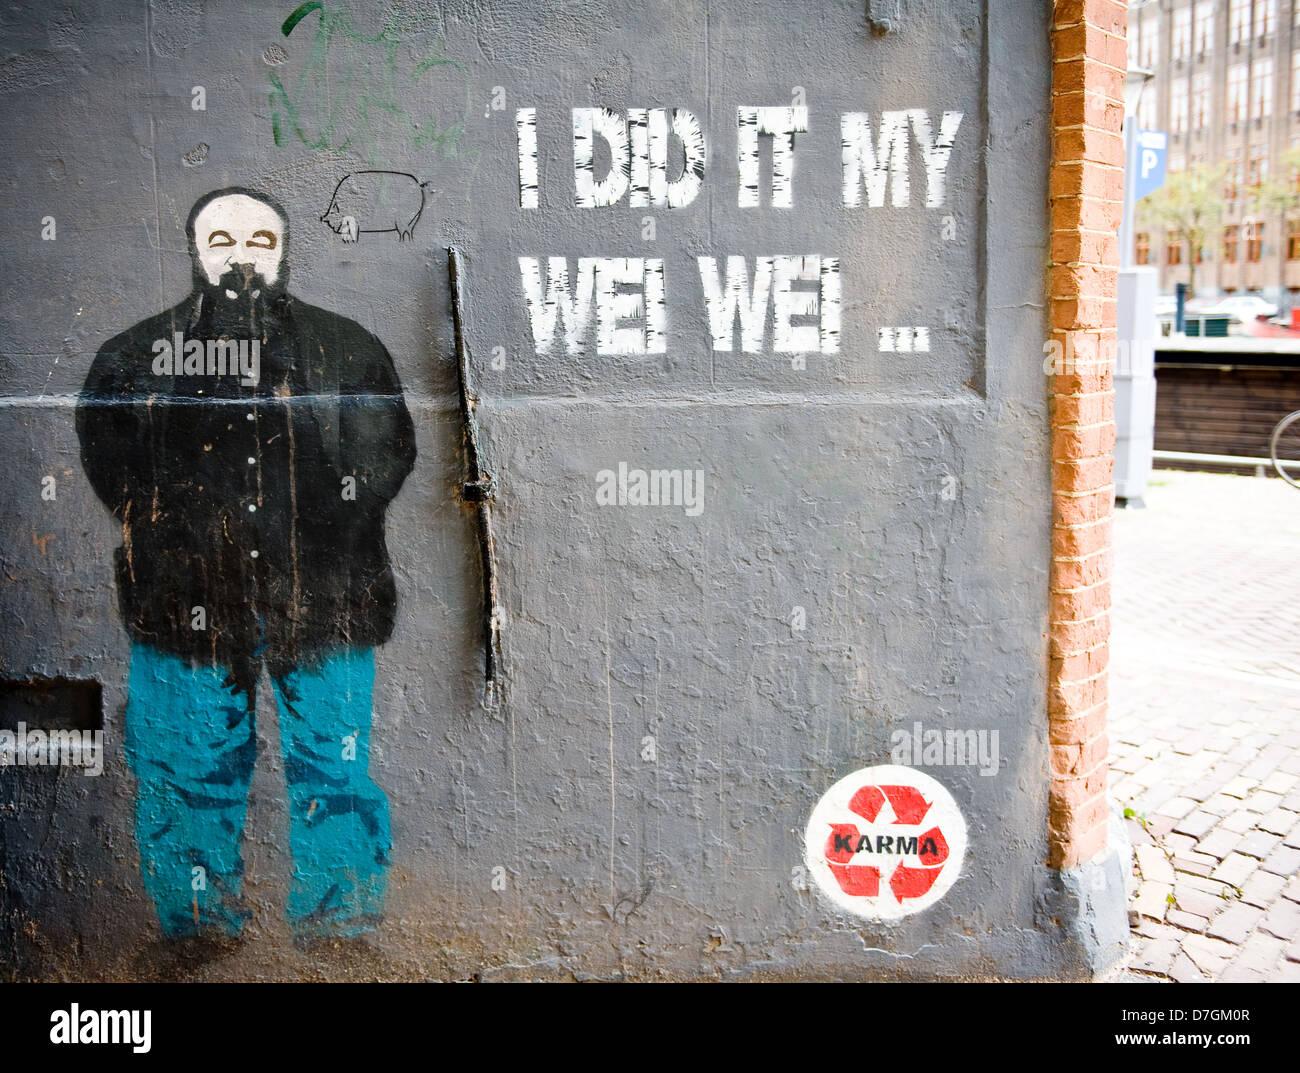 Graffiti wall amsterdam - Graffiti By Street Artist Karma On A Wall In Amsterdam